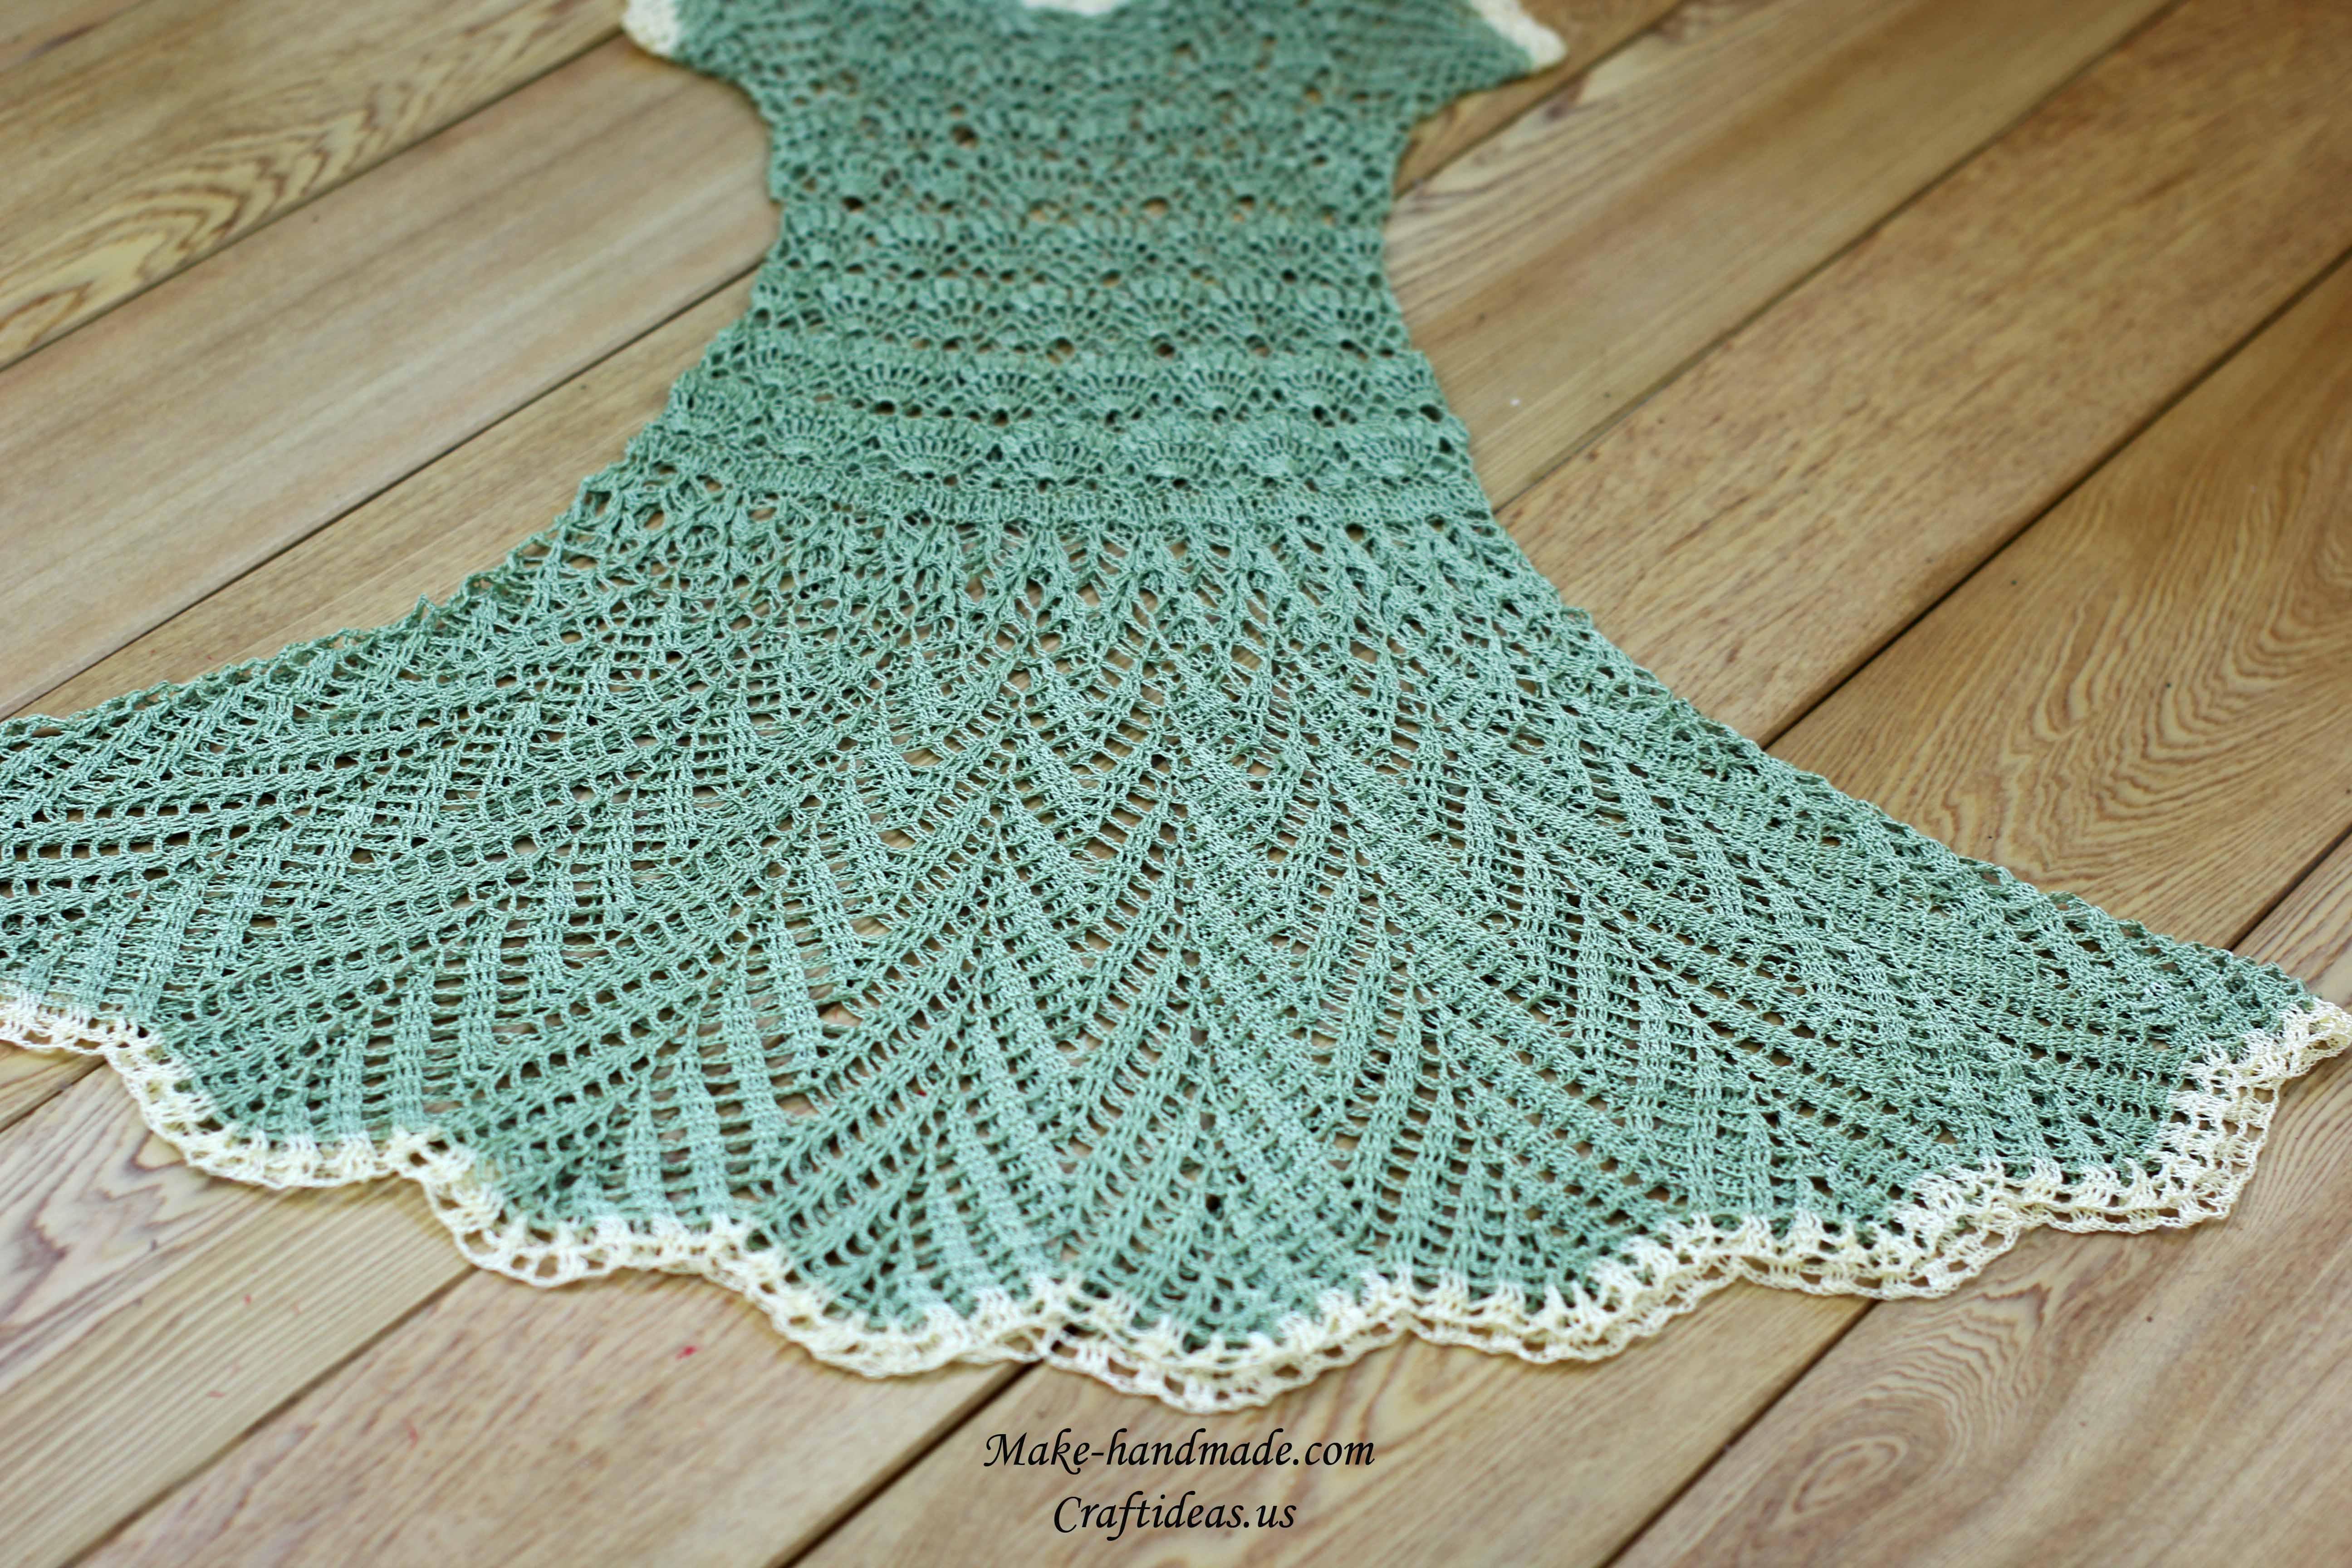 crochet charming summer lace dress for beach